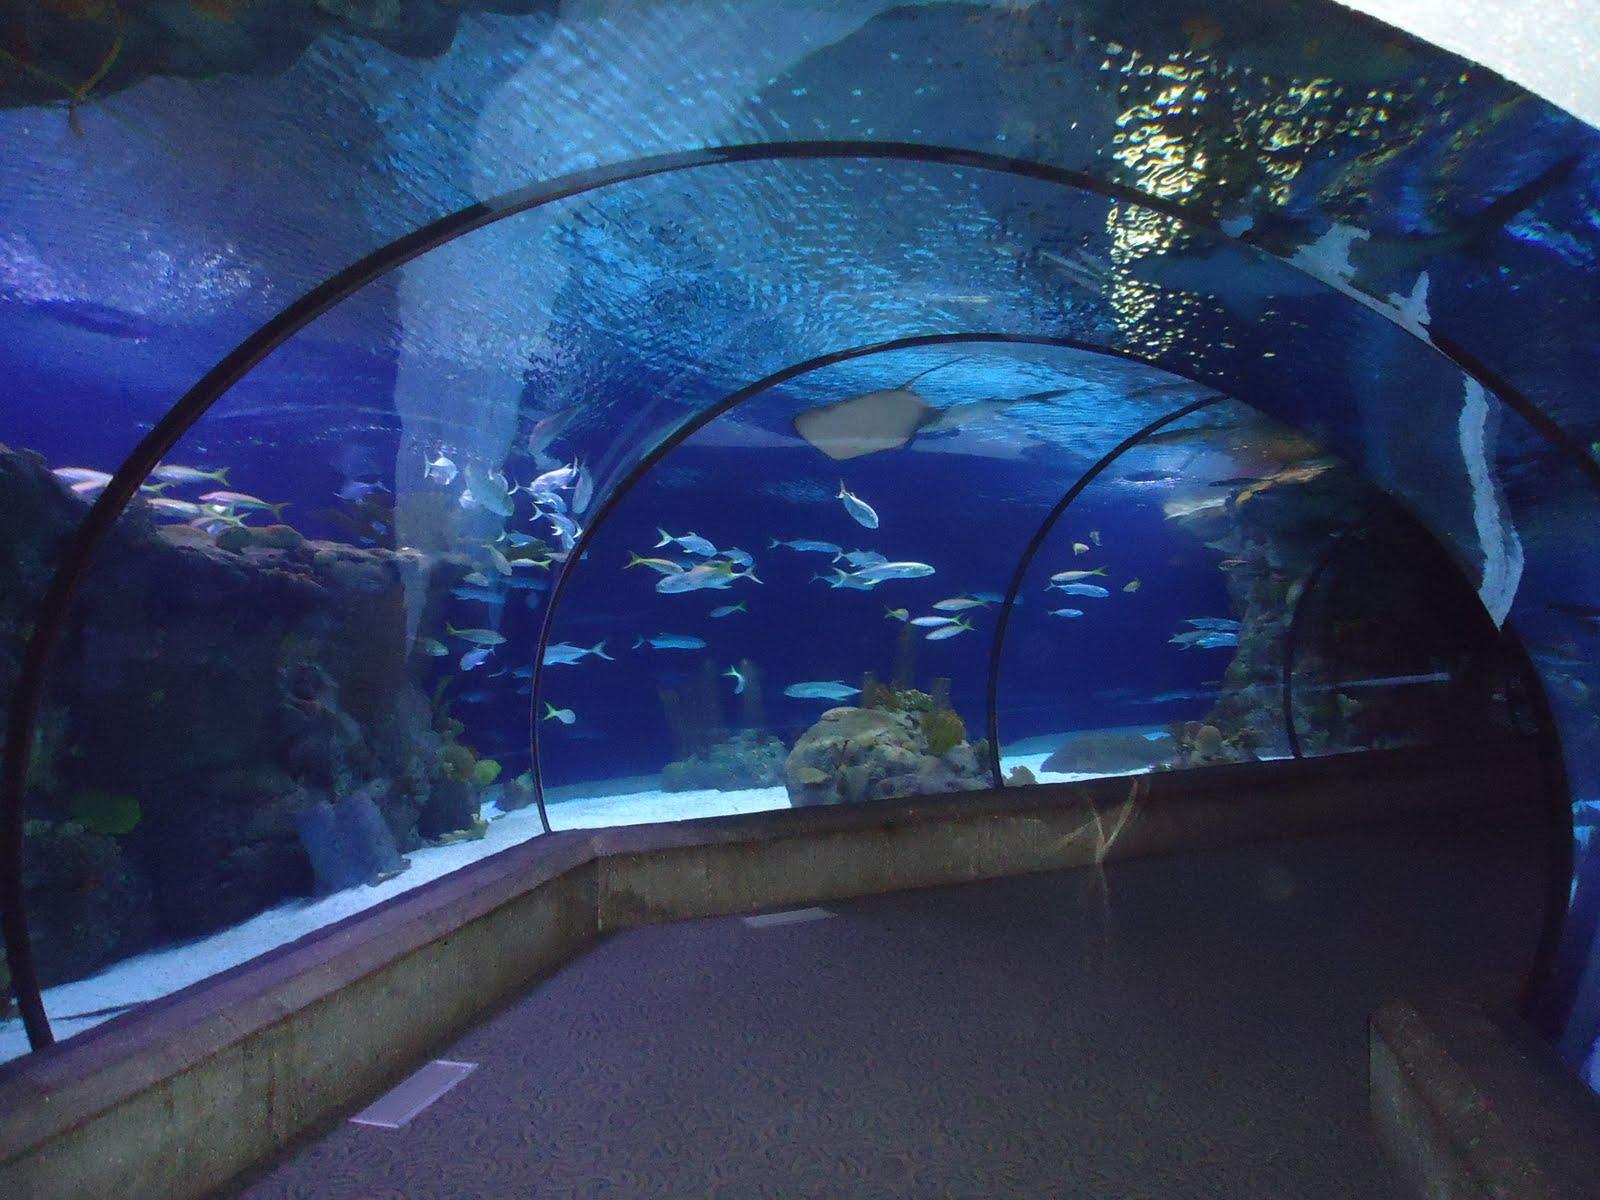 Fish aquarium zoo exploring omaha scott aquarium henry for The fish omaha